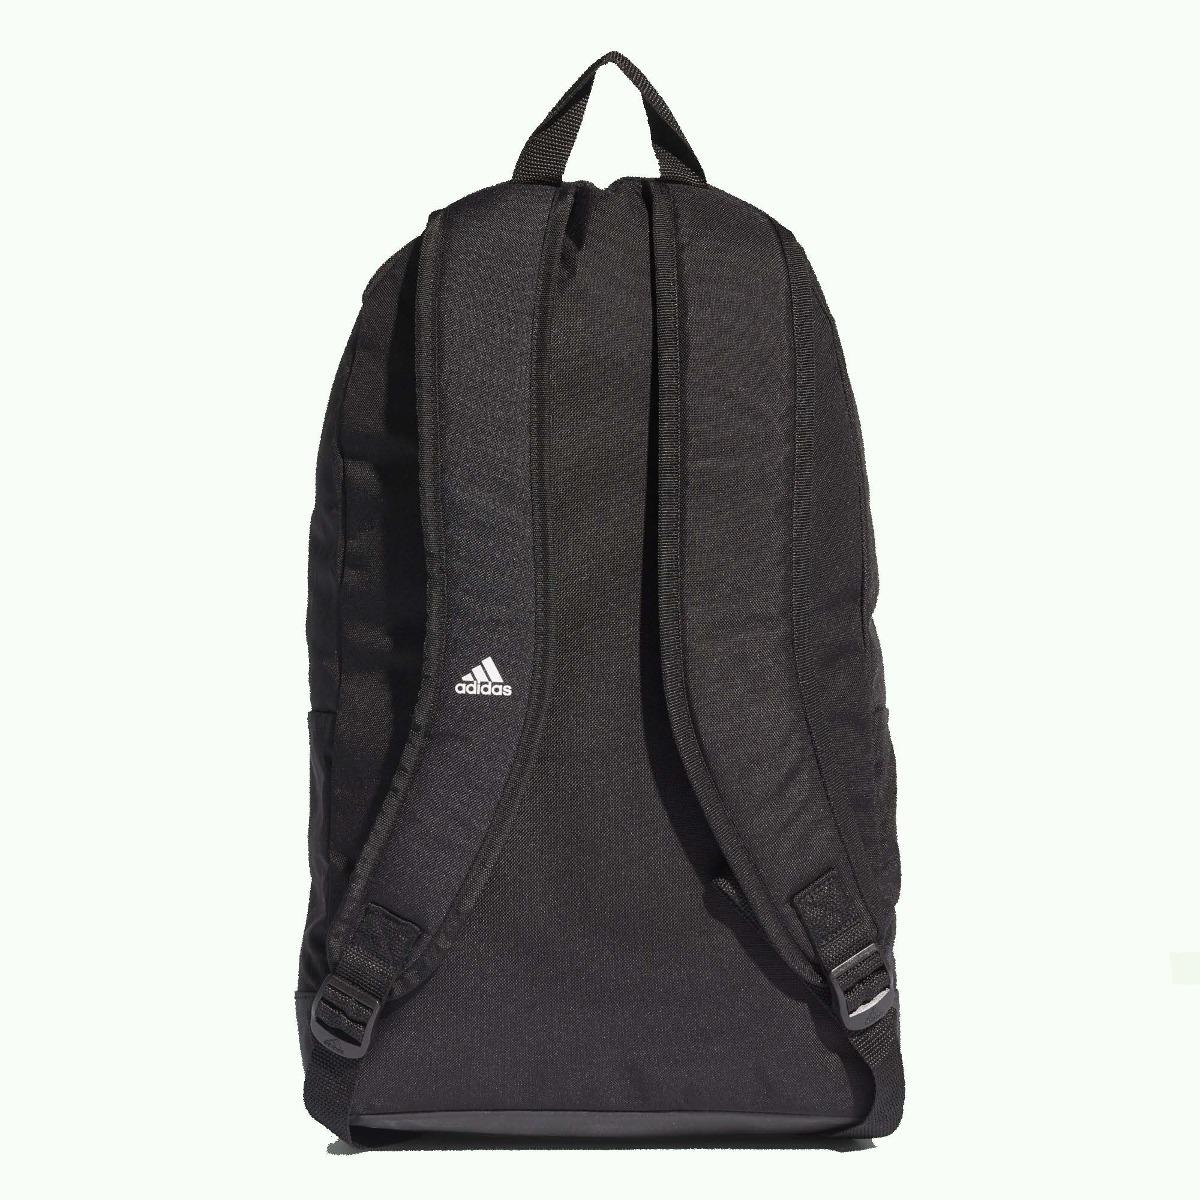 Clasica Unisex Deporfan Negroblanco Mochila Adidas 4Lq3AR5j